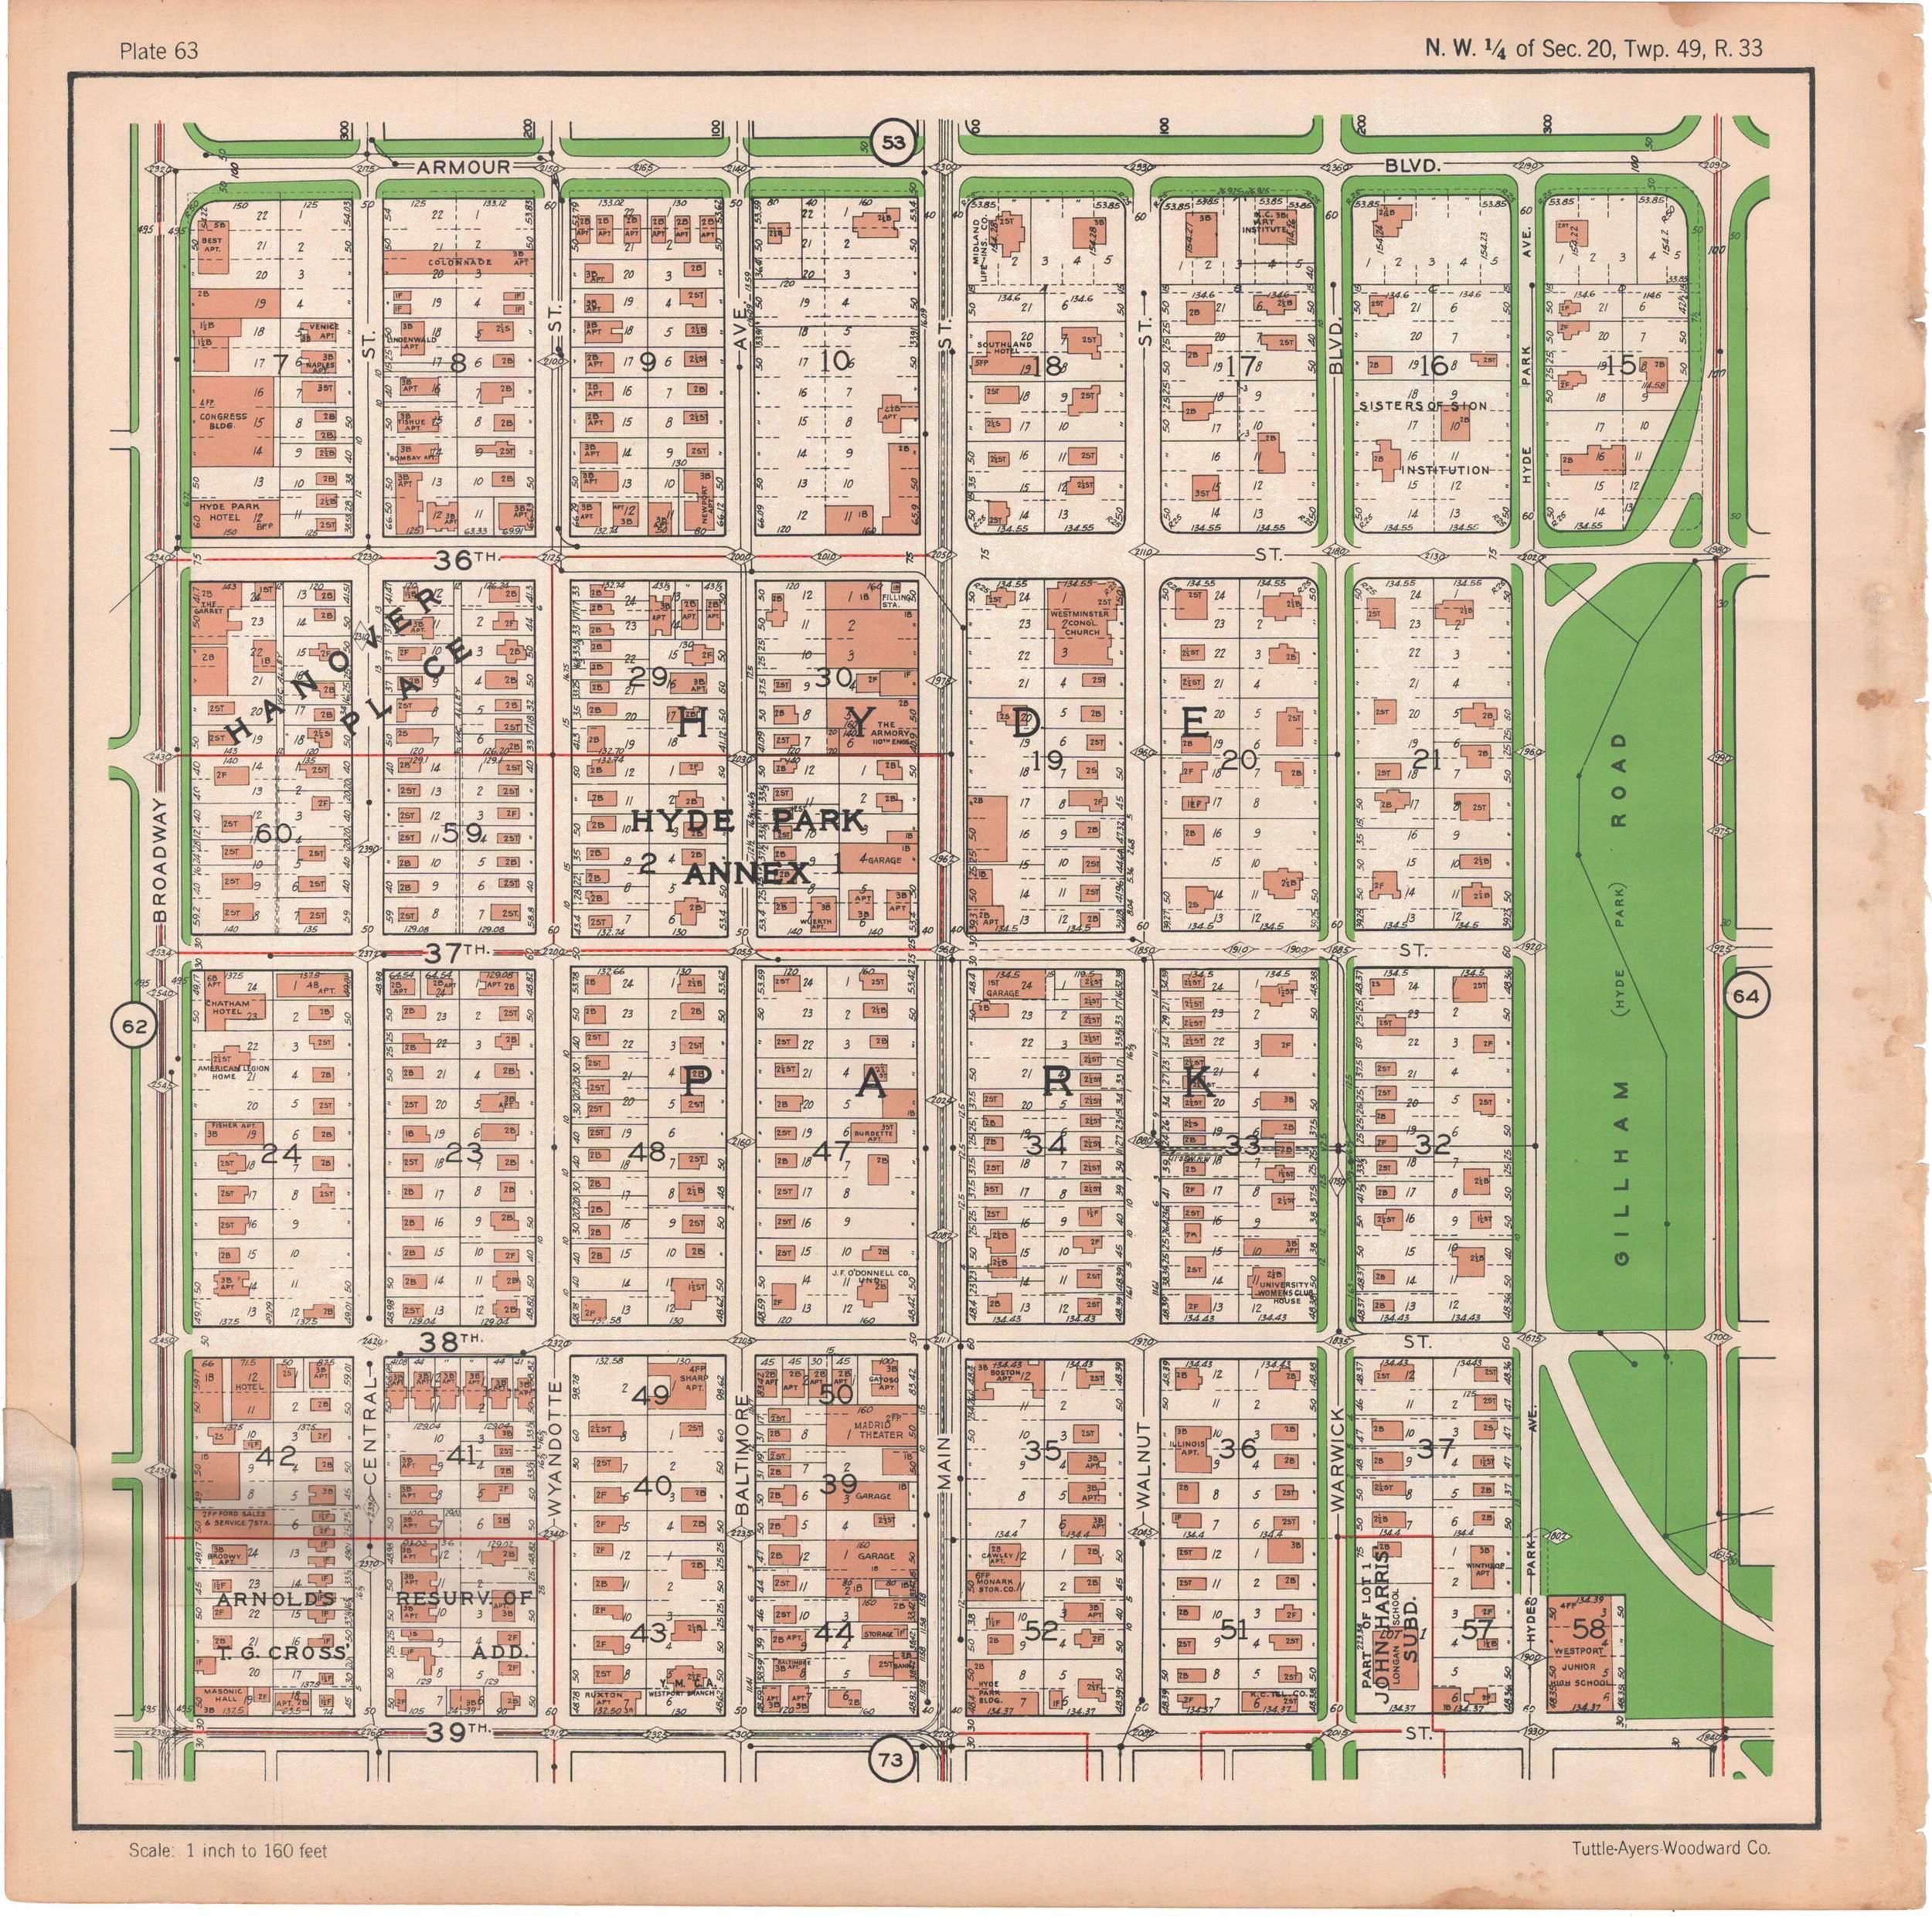 1925 TUTTLE_AYERS_Plate 63.JPG